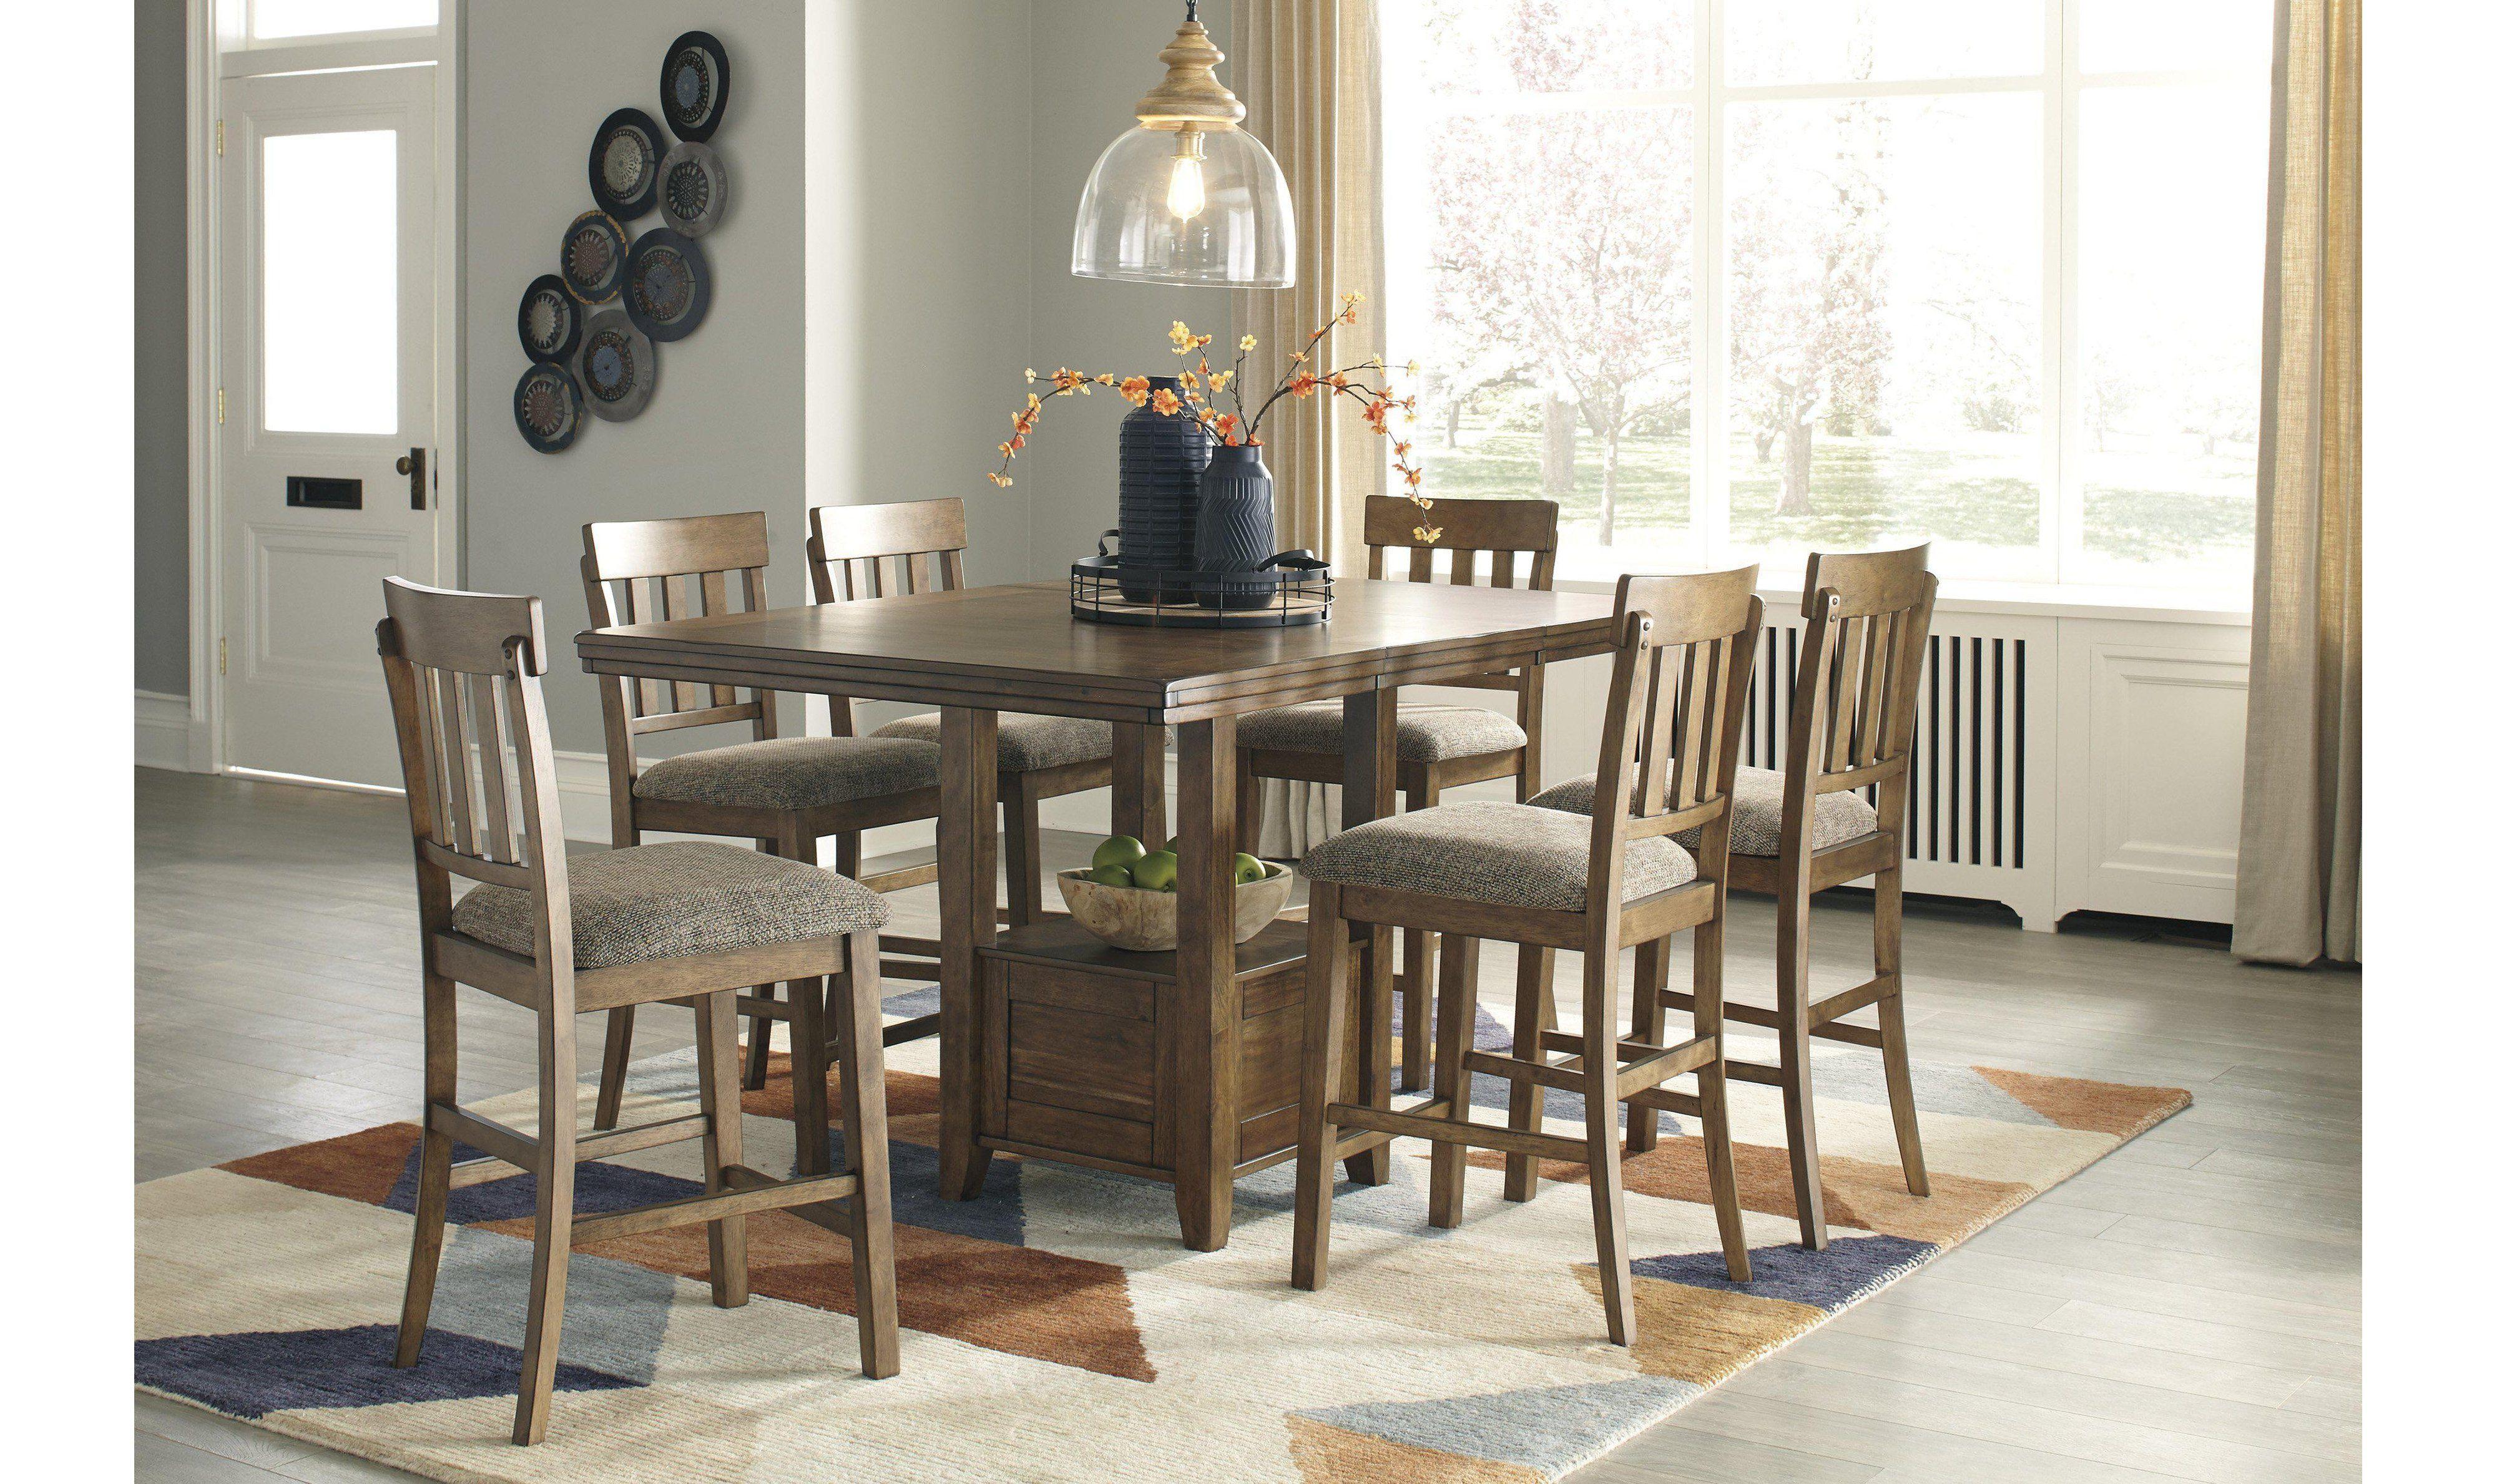 Haddigan Counter Dining Set, Haddigan Counter Height Dining Room Set